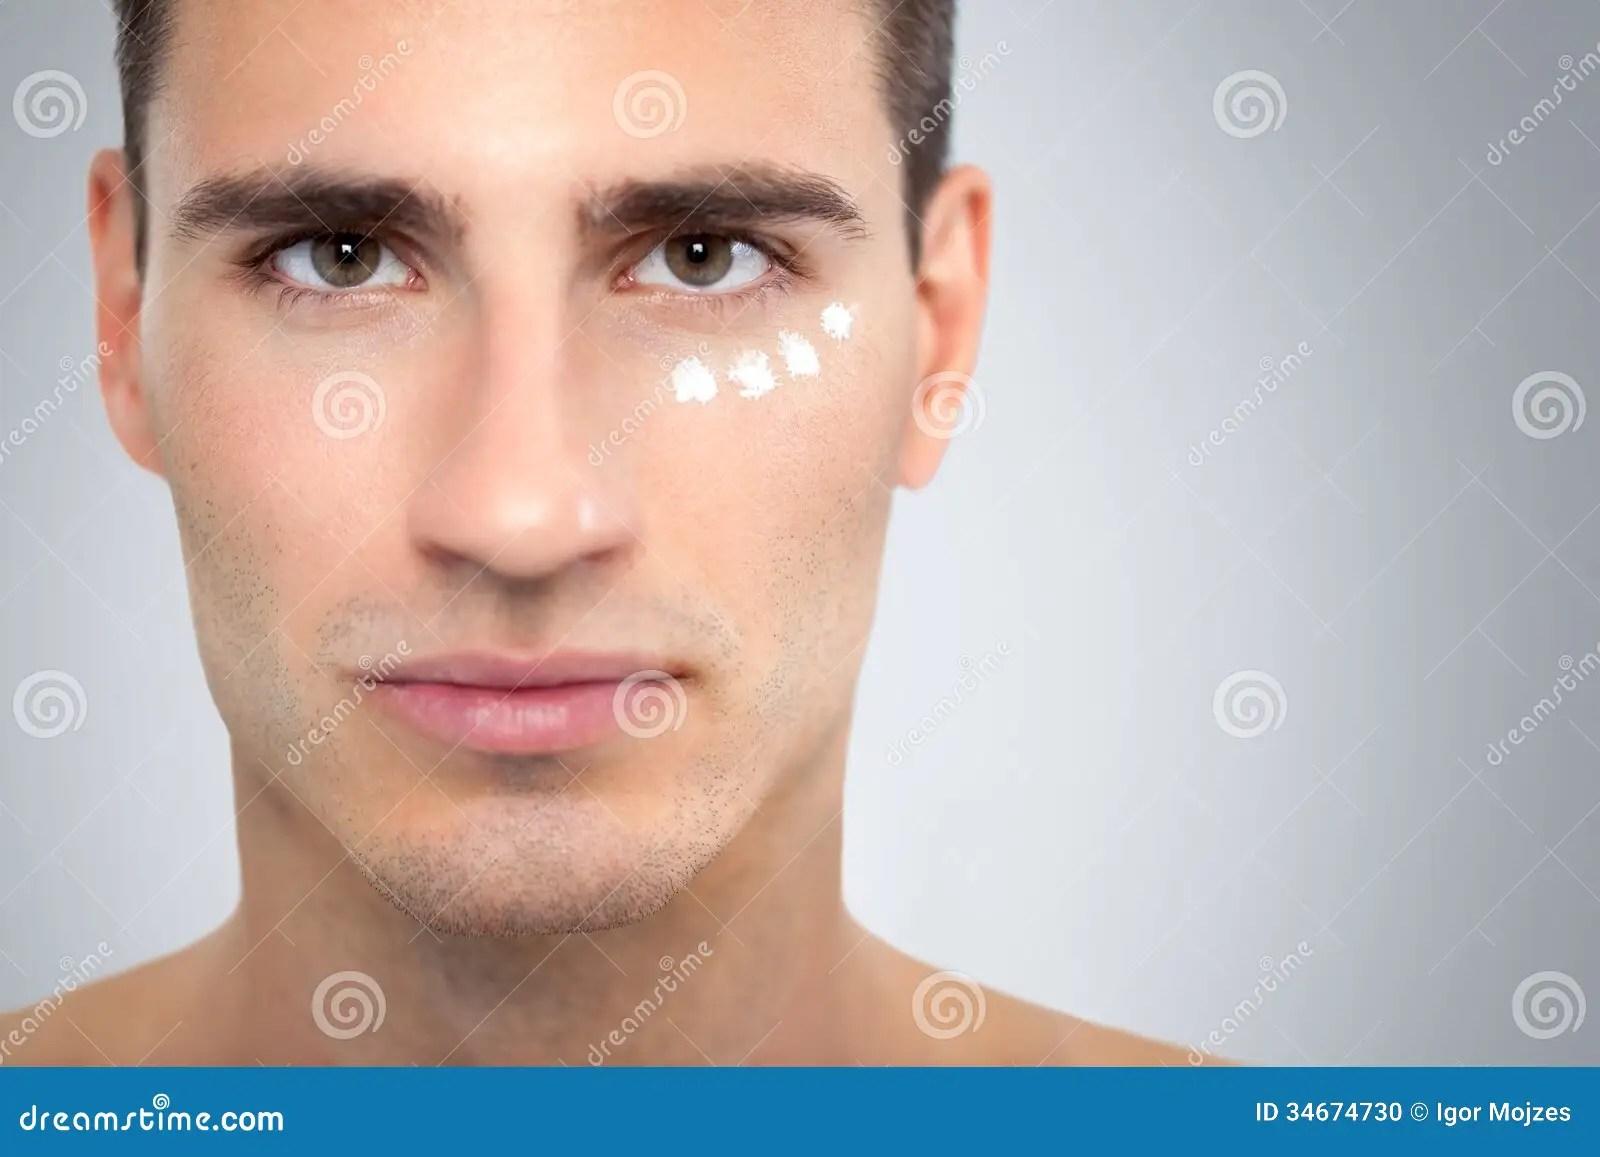 Fresh Anti Aging Cream